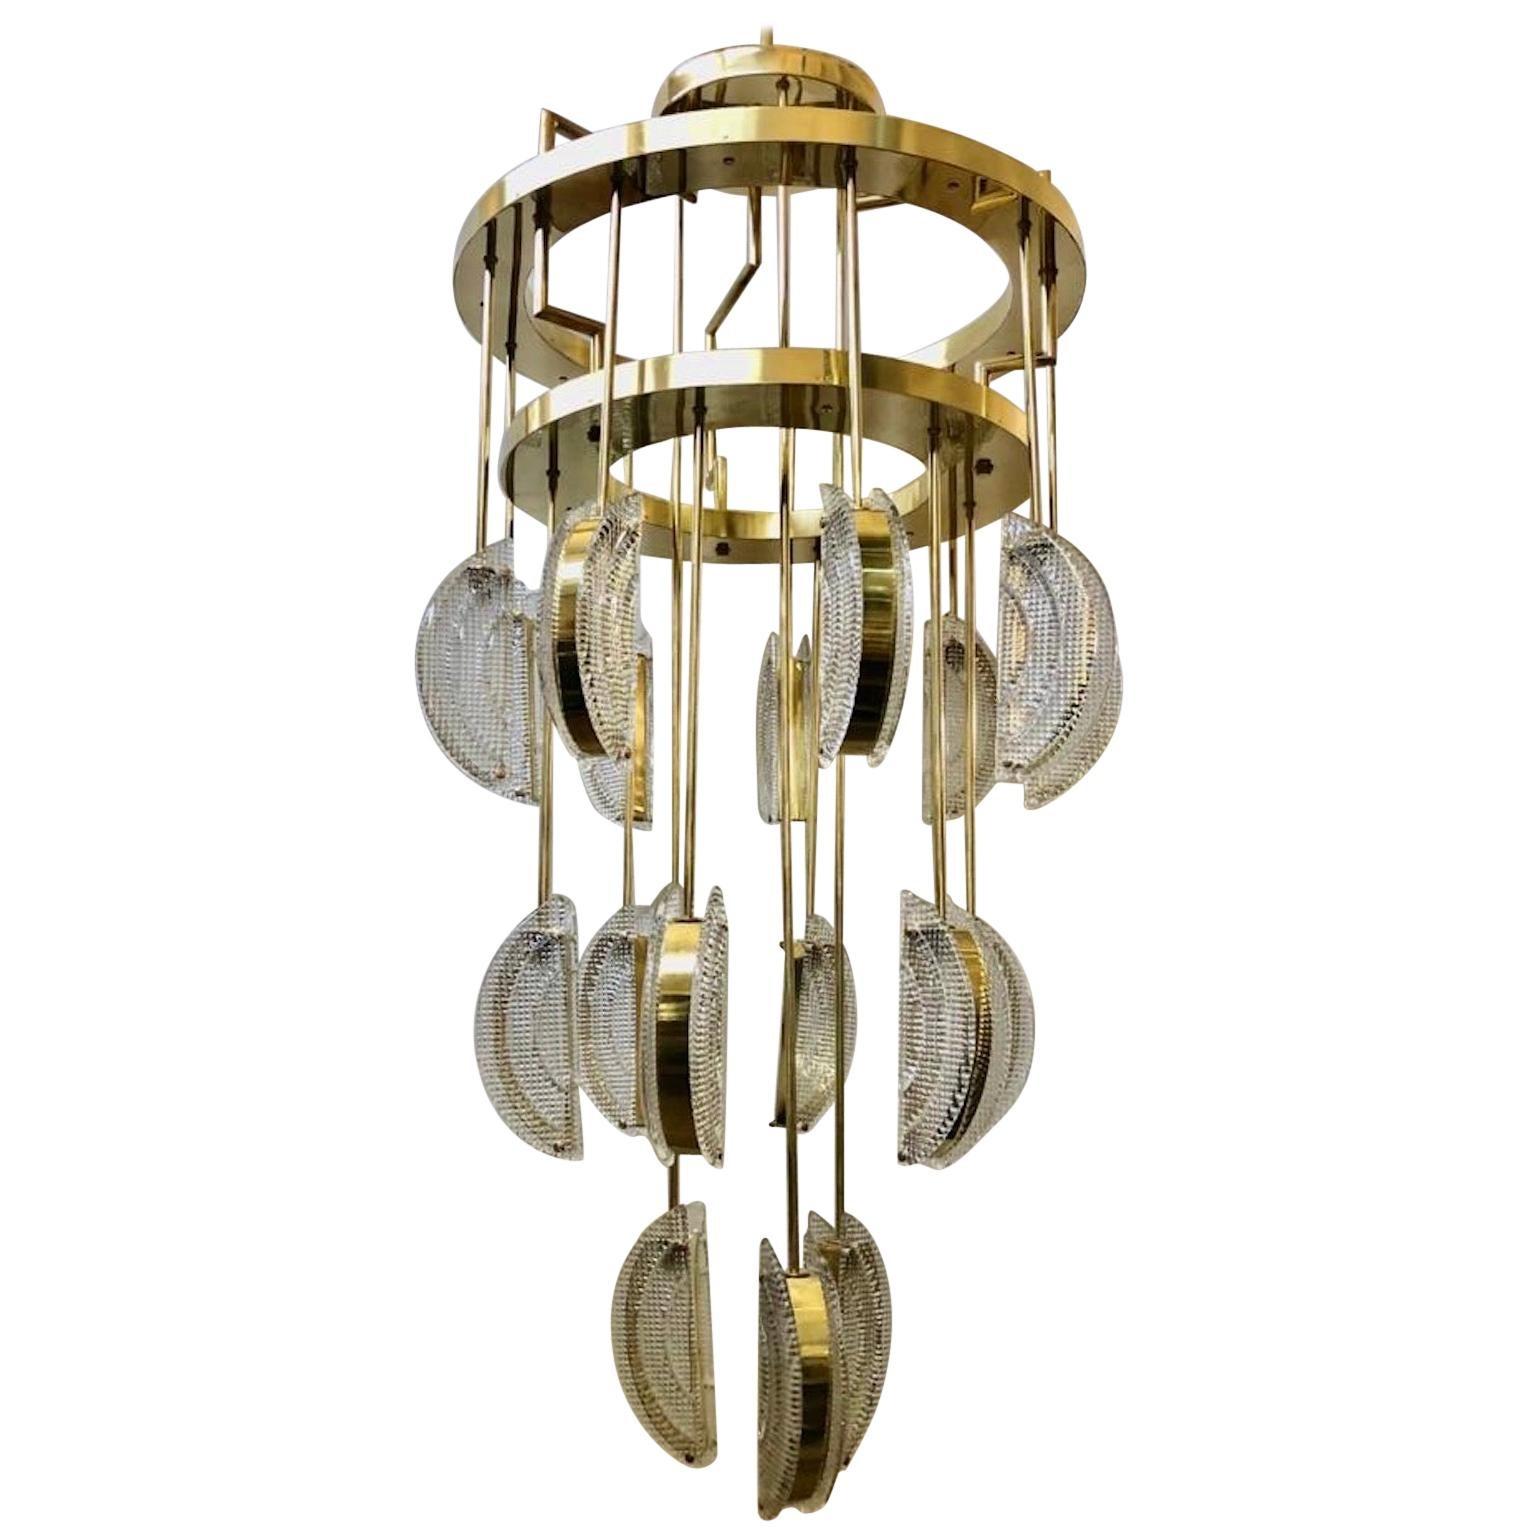 Murano Round Art Glass and Brass Mid-Century Chandelier, 1970